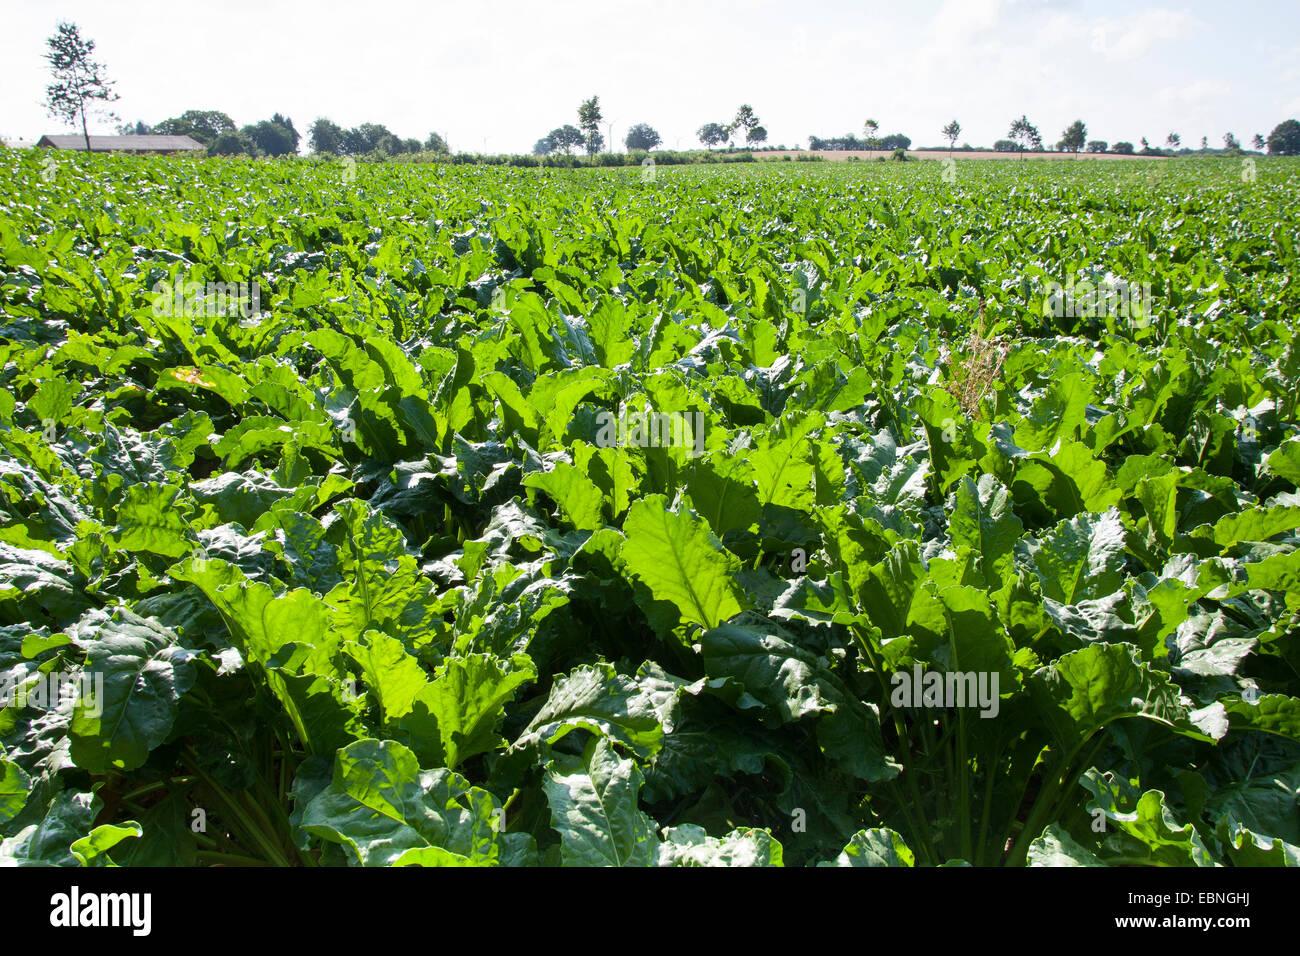 Sugar beet, Sugar-beet, Beet root, Sugar-beet root (Beta vulgaris var. altissima), sugar beet field, Germany - Stock Image